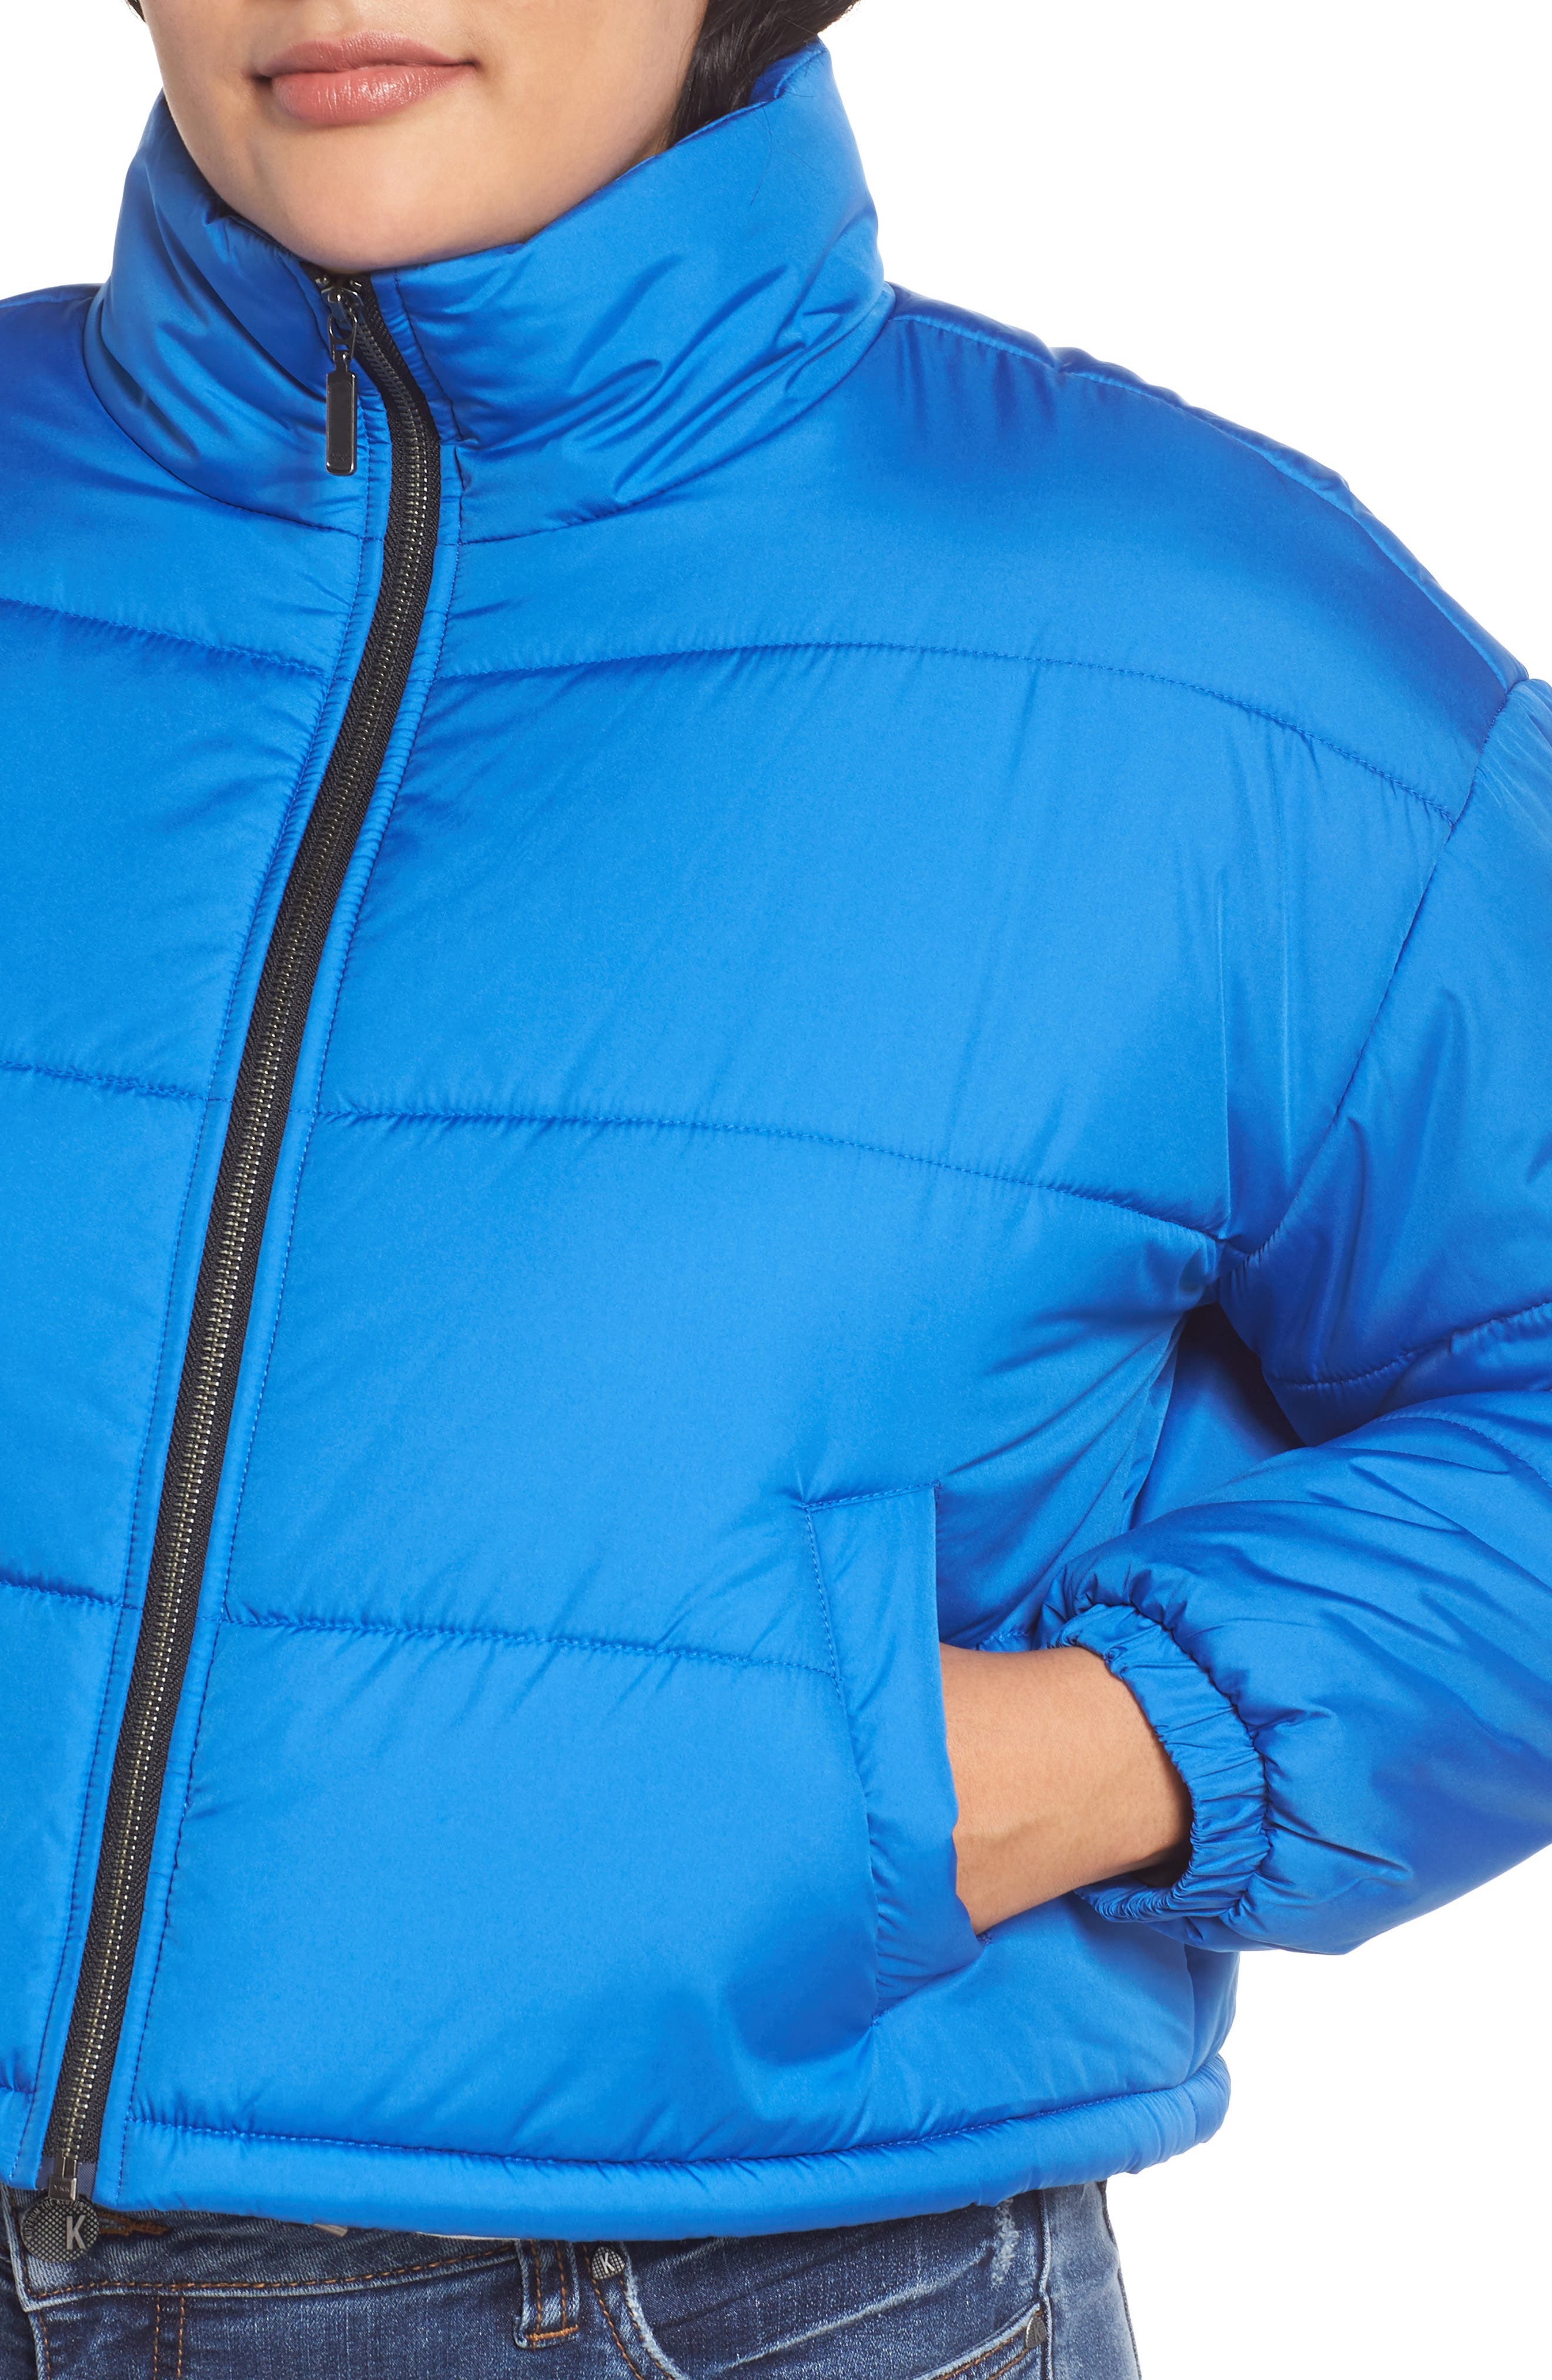 Crop Puffer Jacket,                             Alternate thumbnail 11, color,                             BLUE BOAT